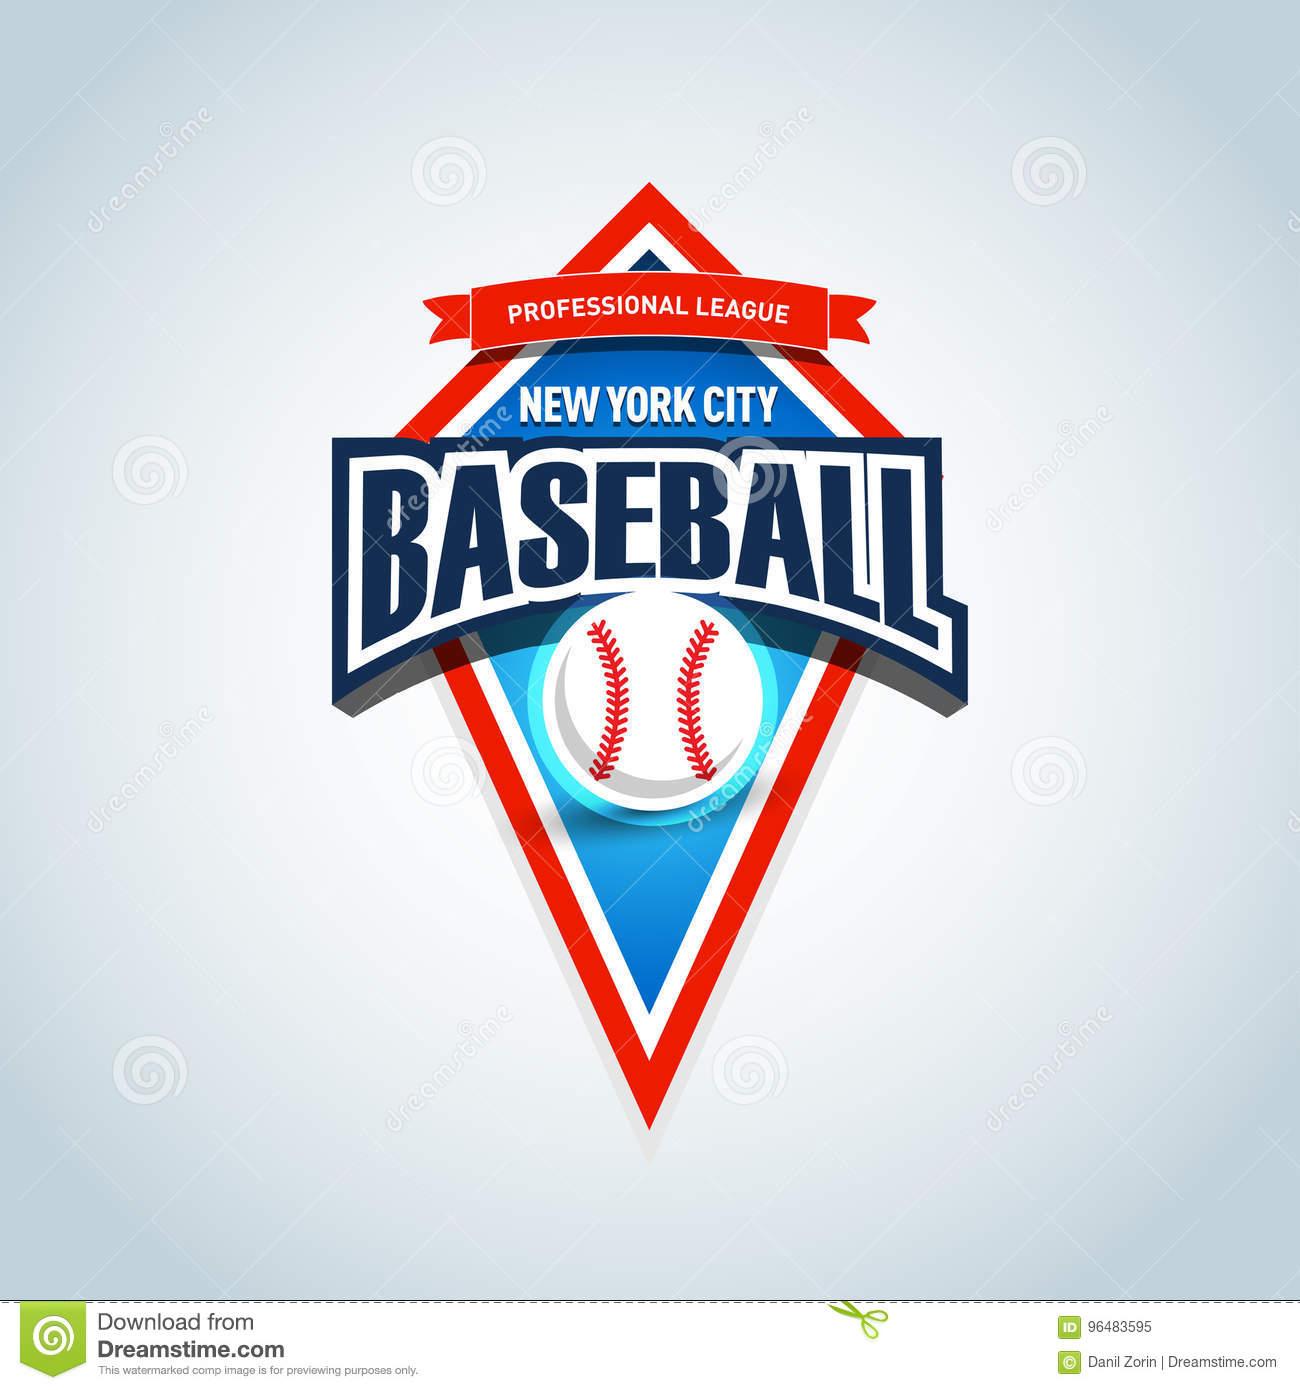 Baseball Team Logo Template. Baseball Emblem, Logotype Template, T - Free Printable Baseball Logos